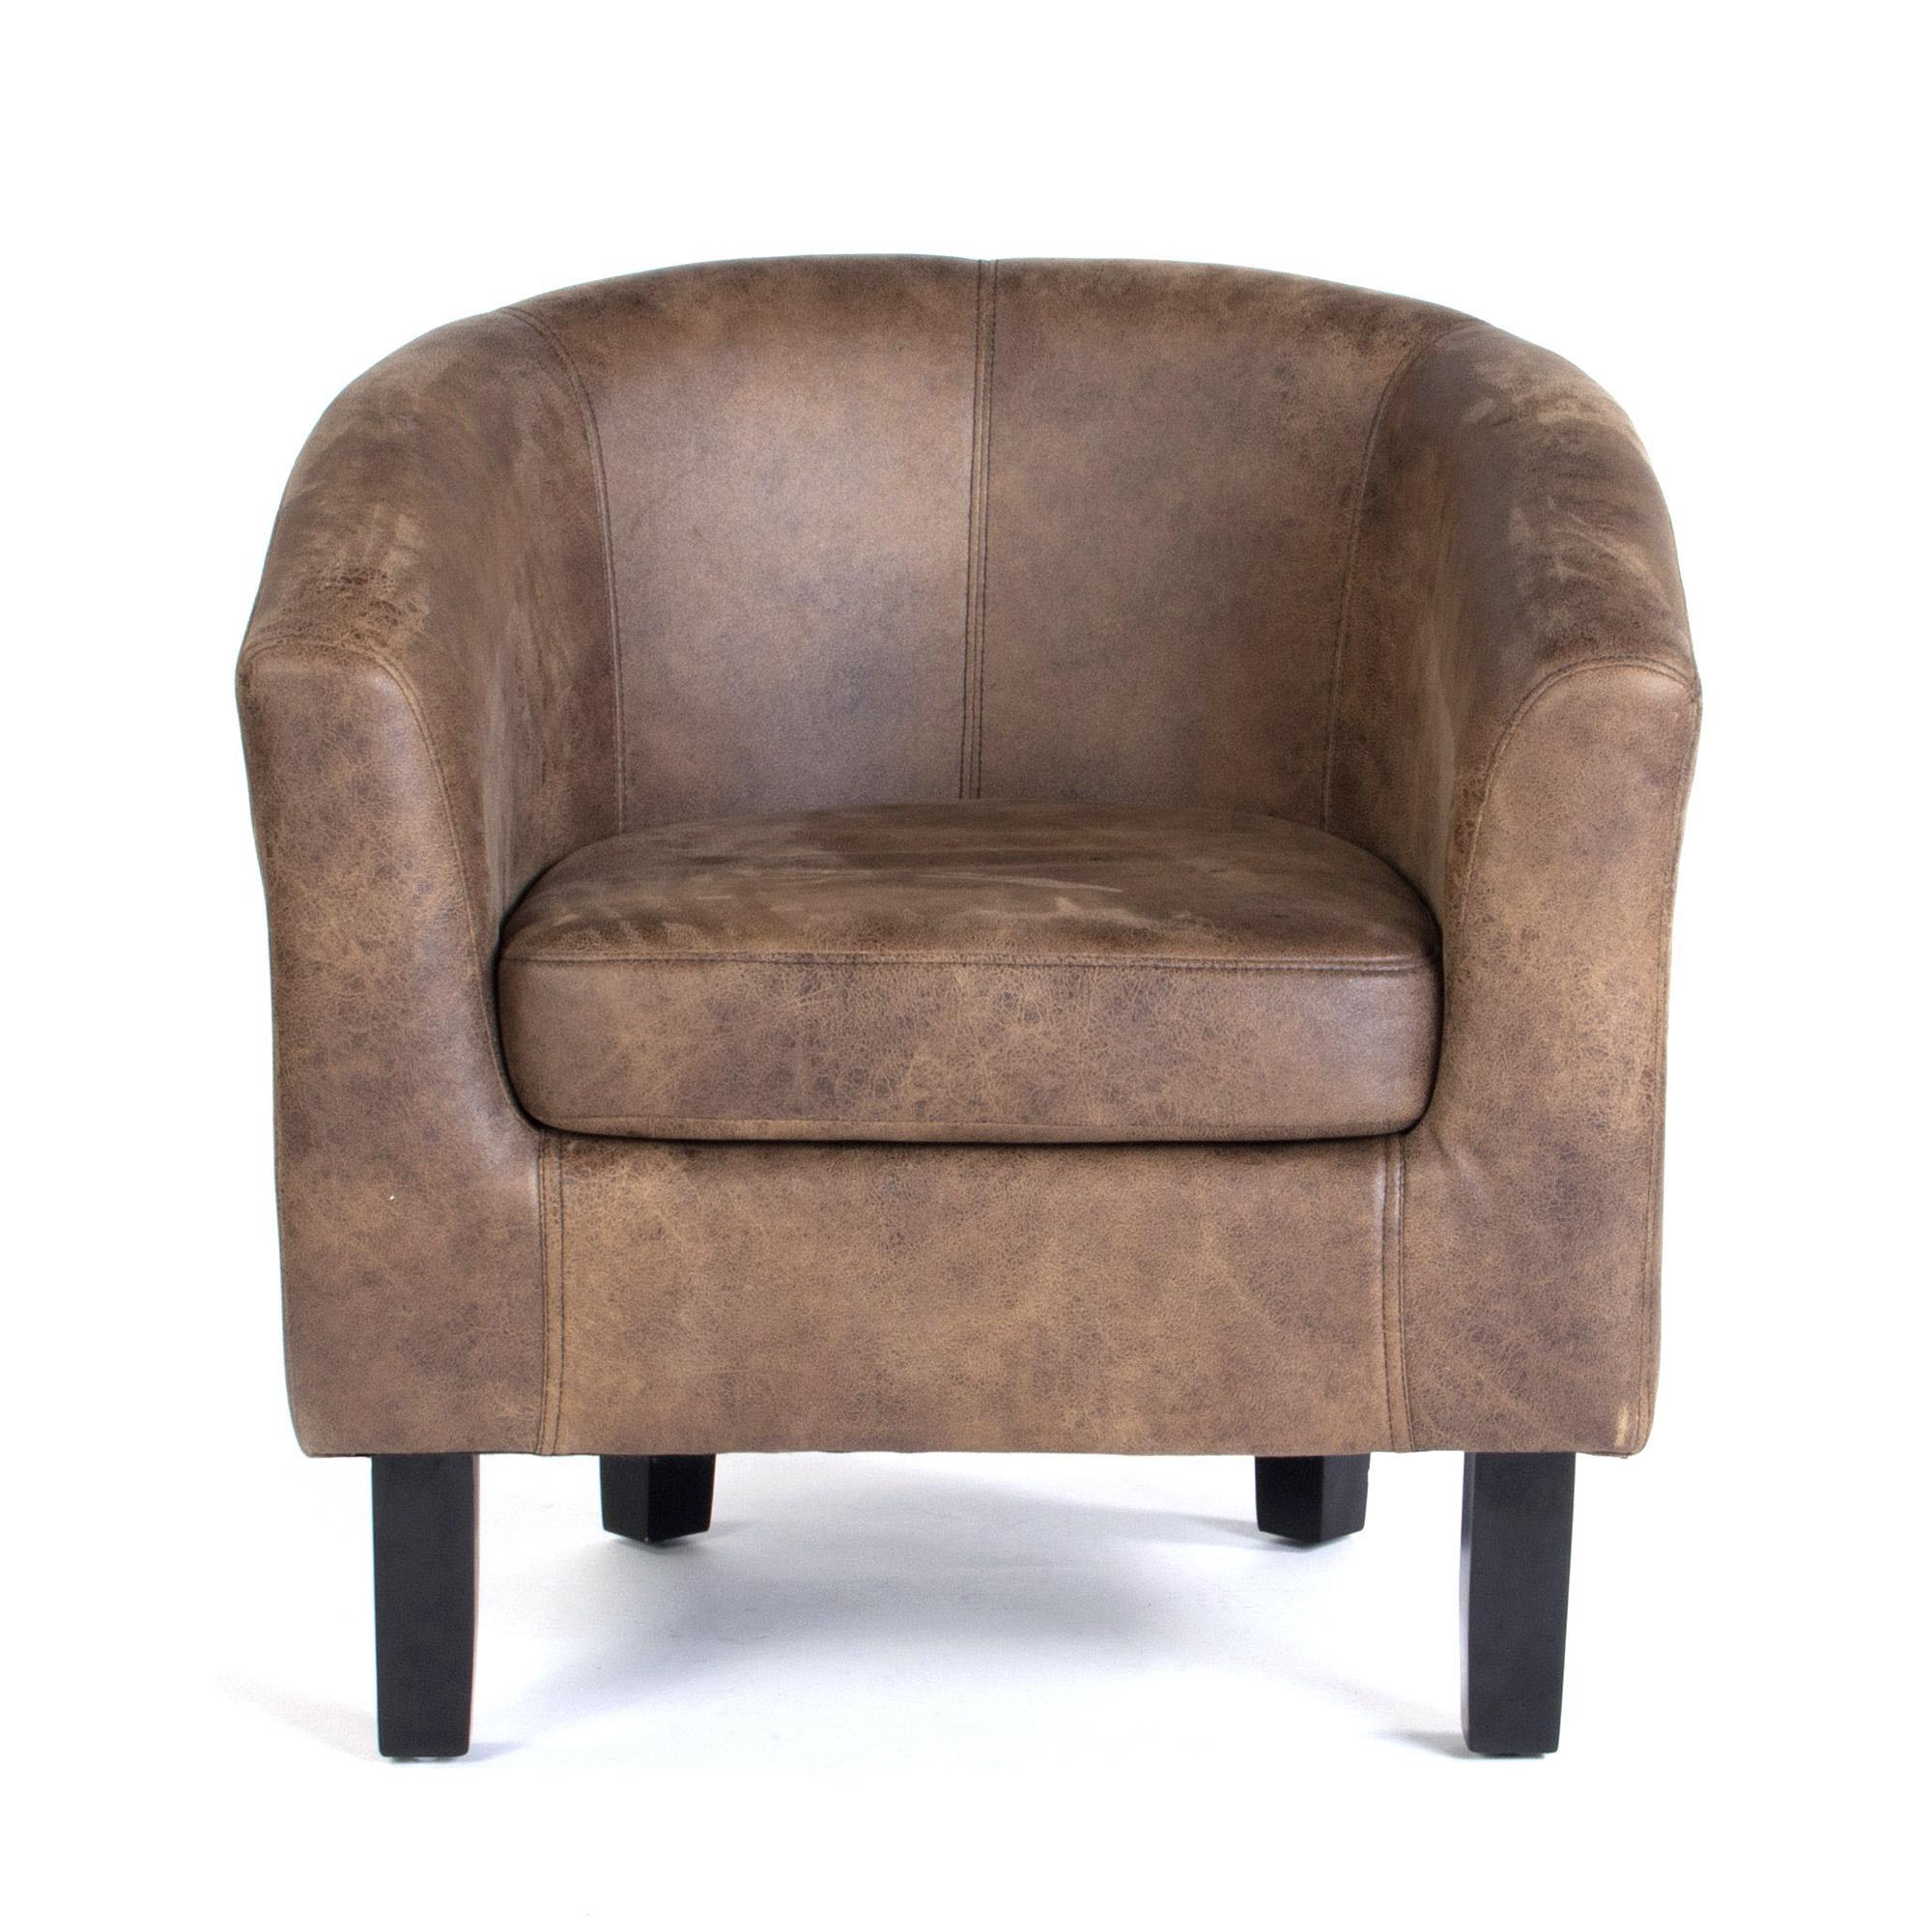 Faux Leather Tub Chair - Tan | Dunelm